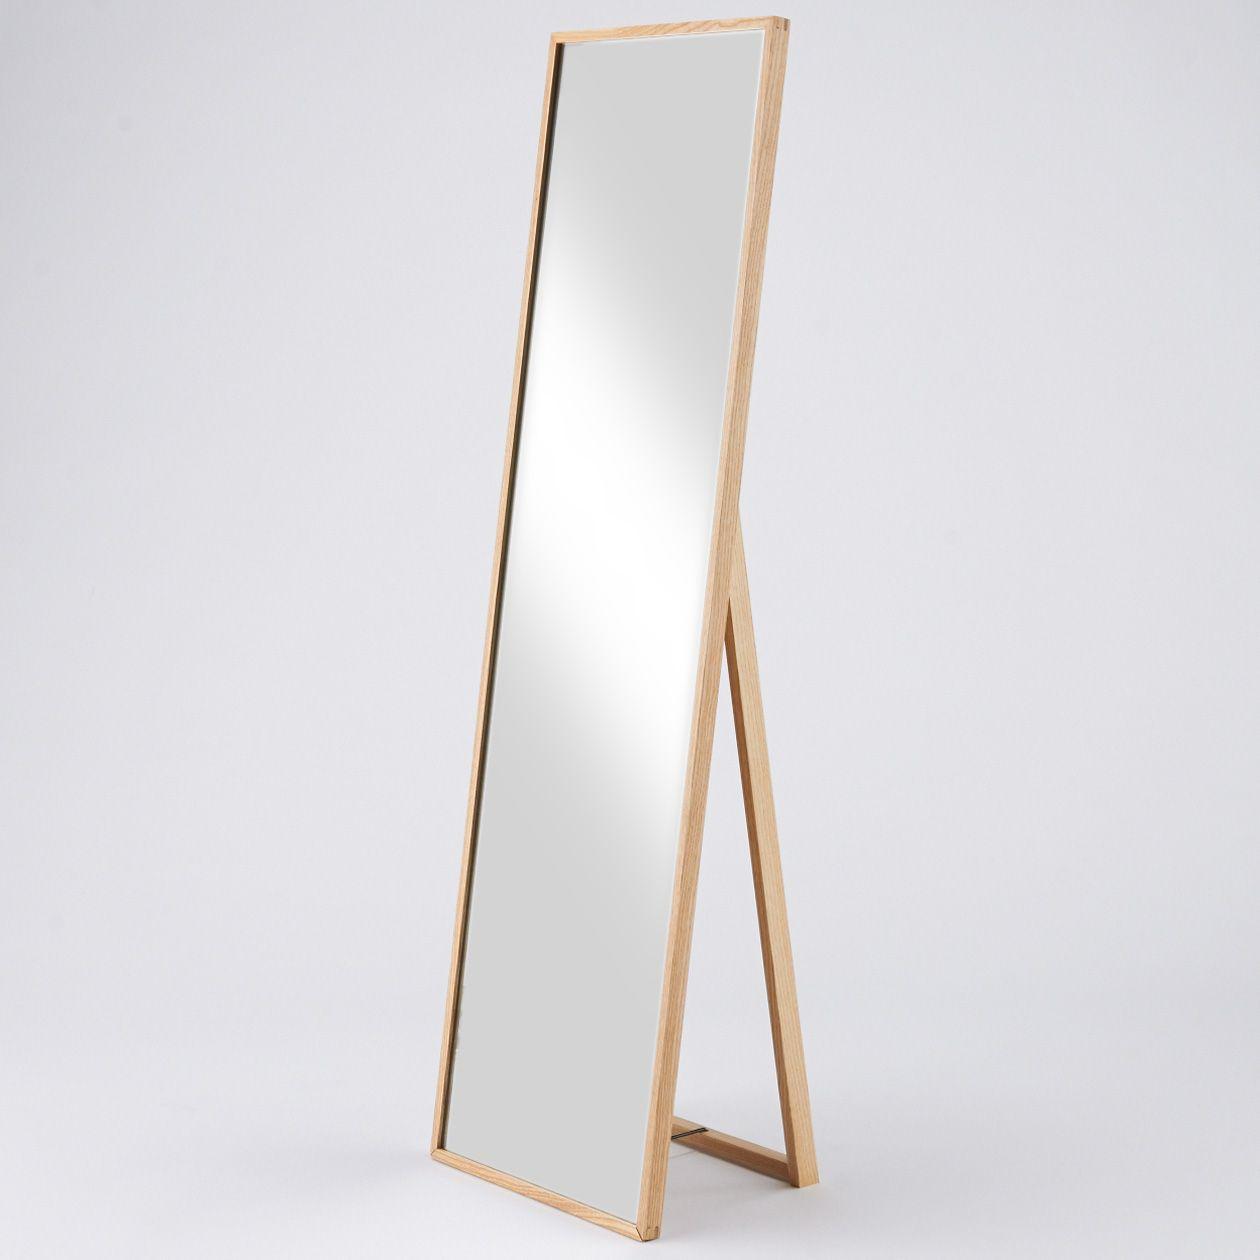 Oak Frame Mirror | Furniture | Pinterest | Muji online, Muji and ...